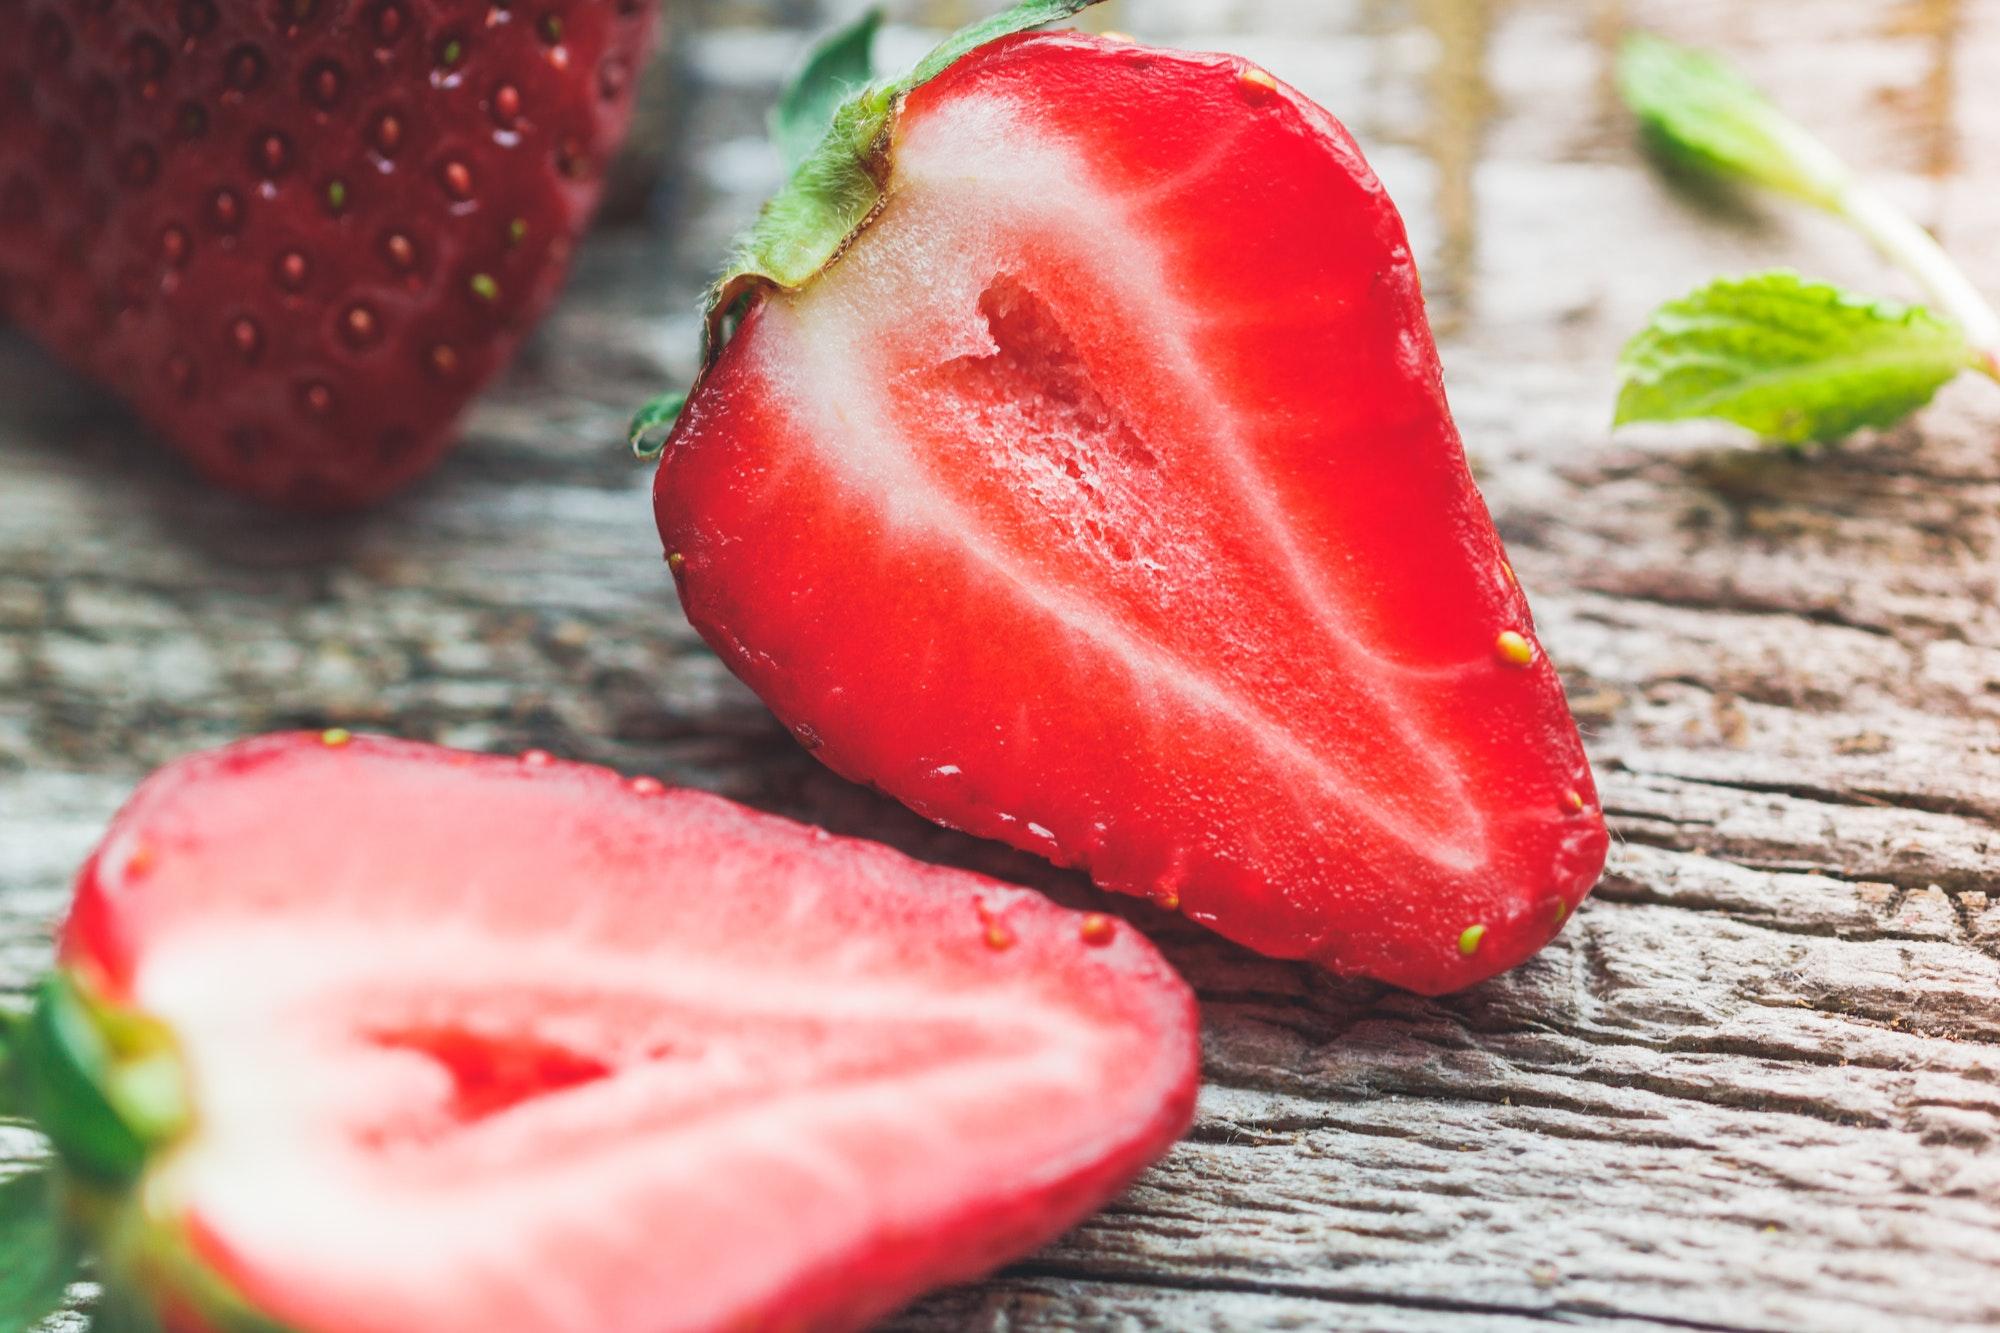 Halves of ripe strawberry